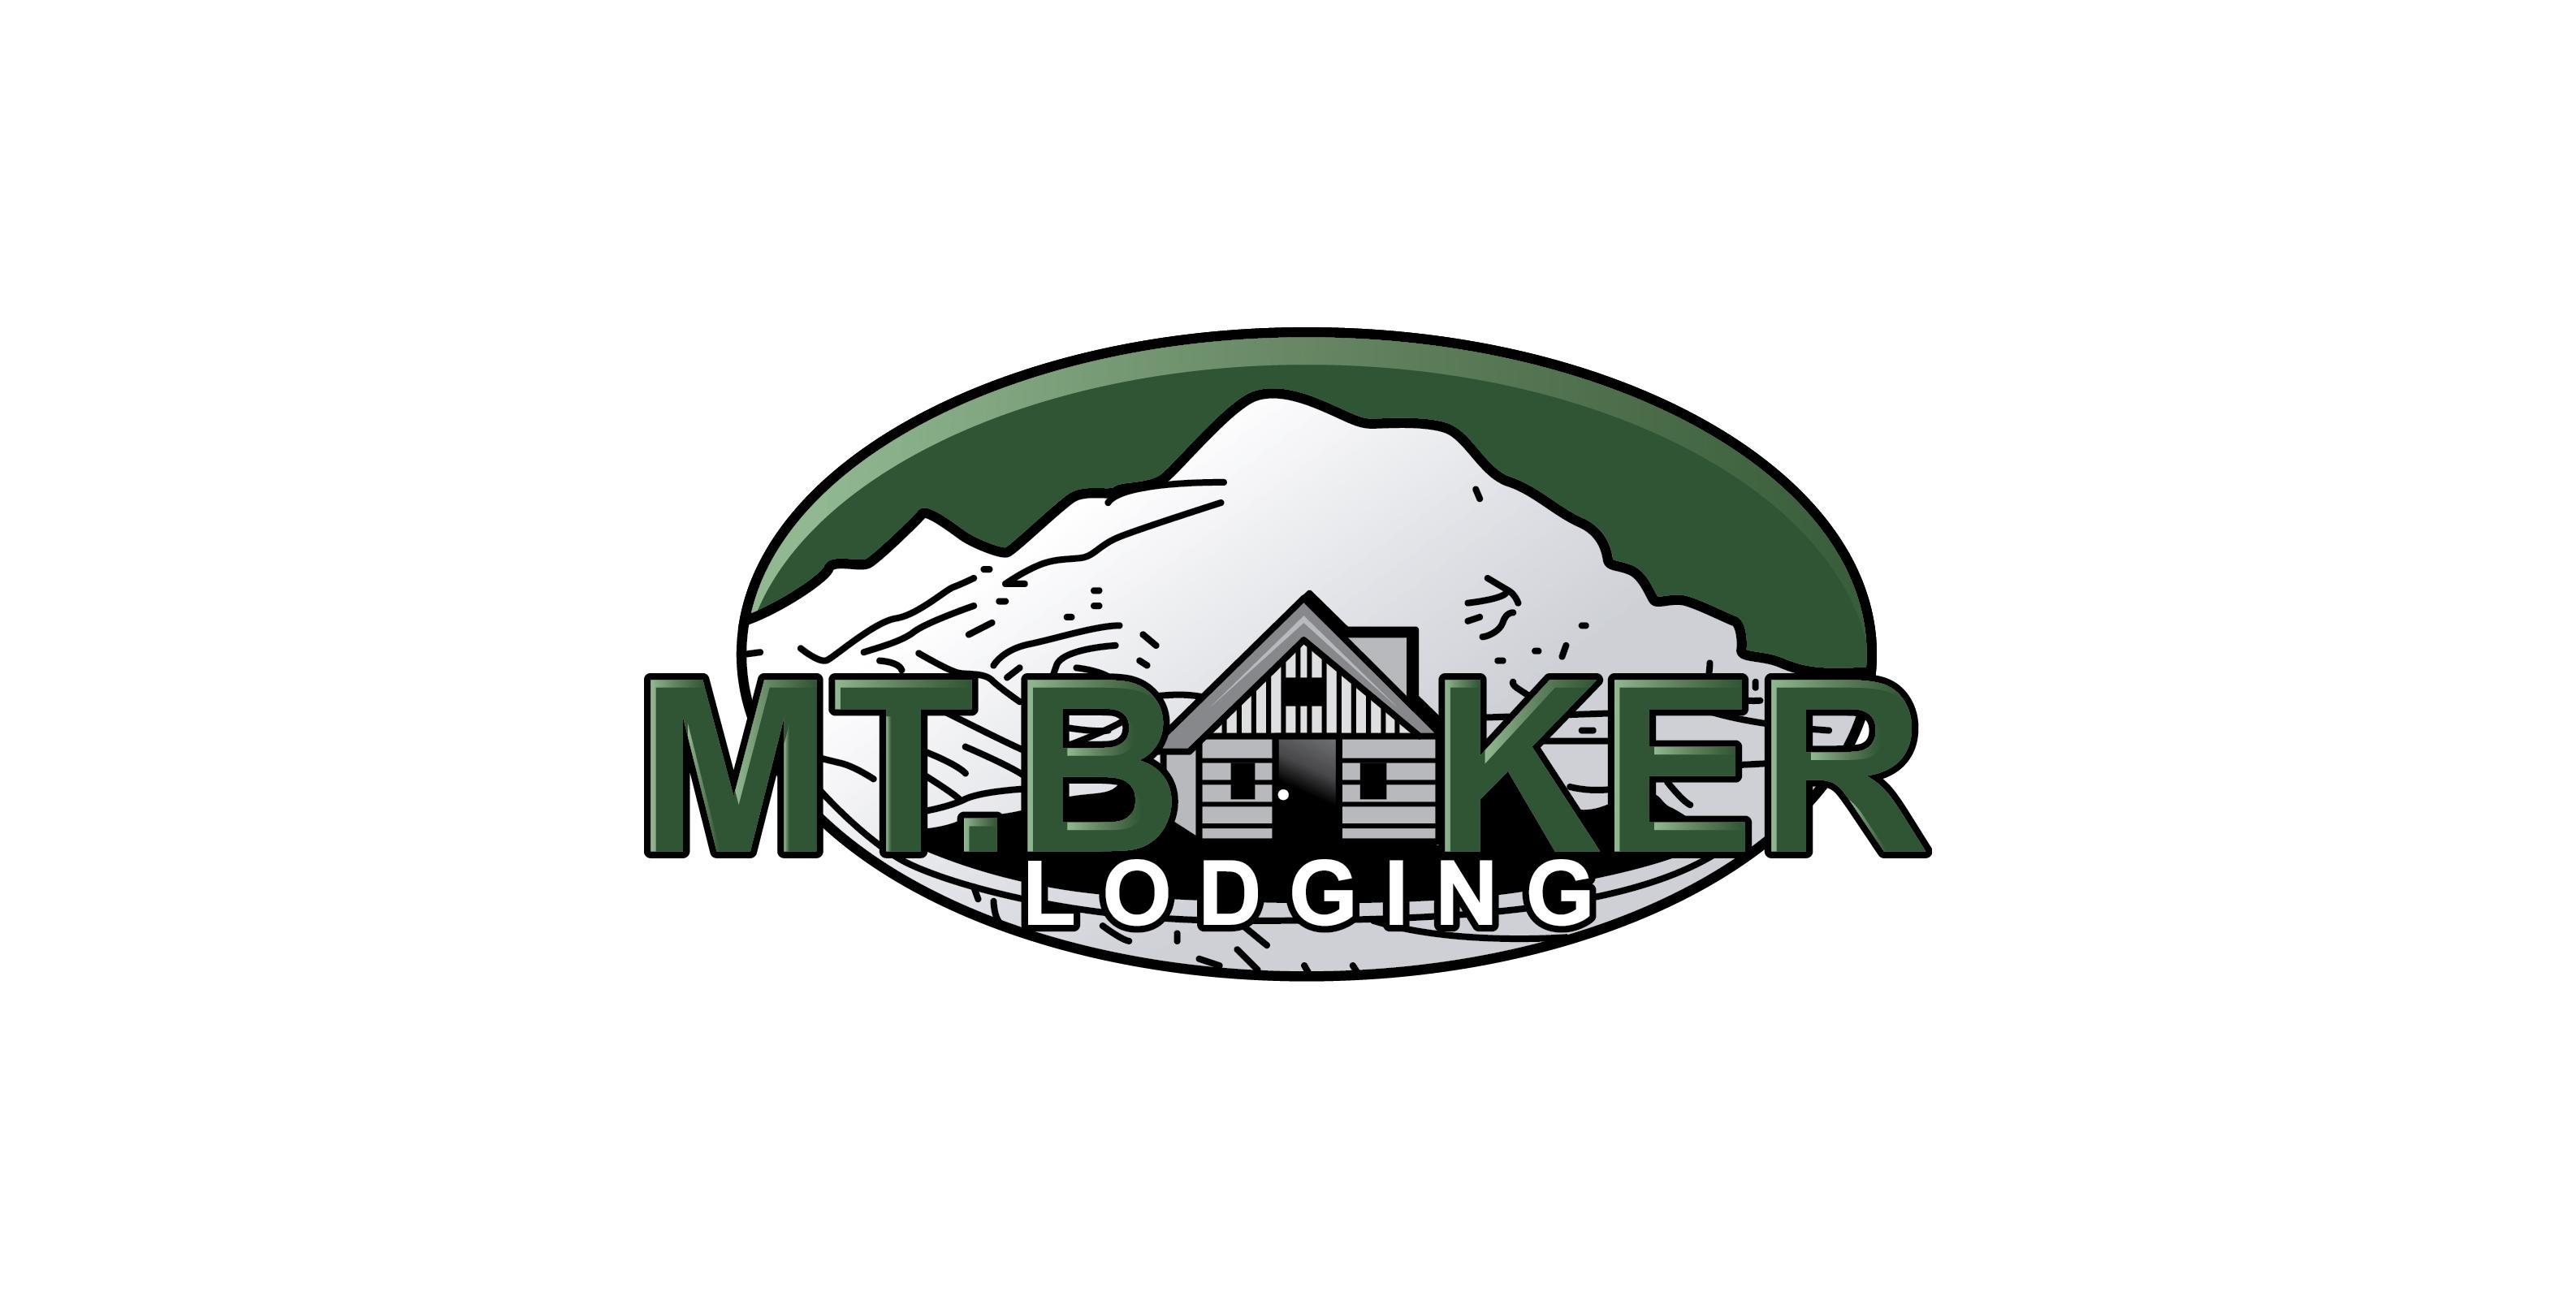 Apartment Mt  Baker Lodging Cabin  21  ndash  REAL LOG CABIN  PETS OK  SLEEPS-6  photo 31816927